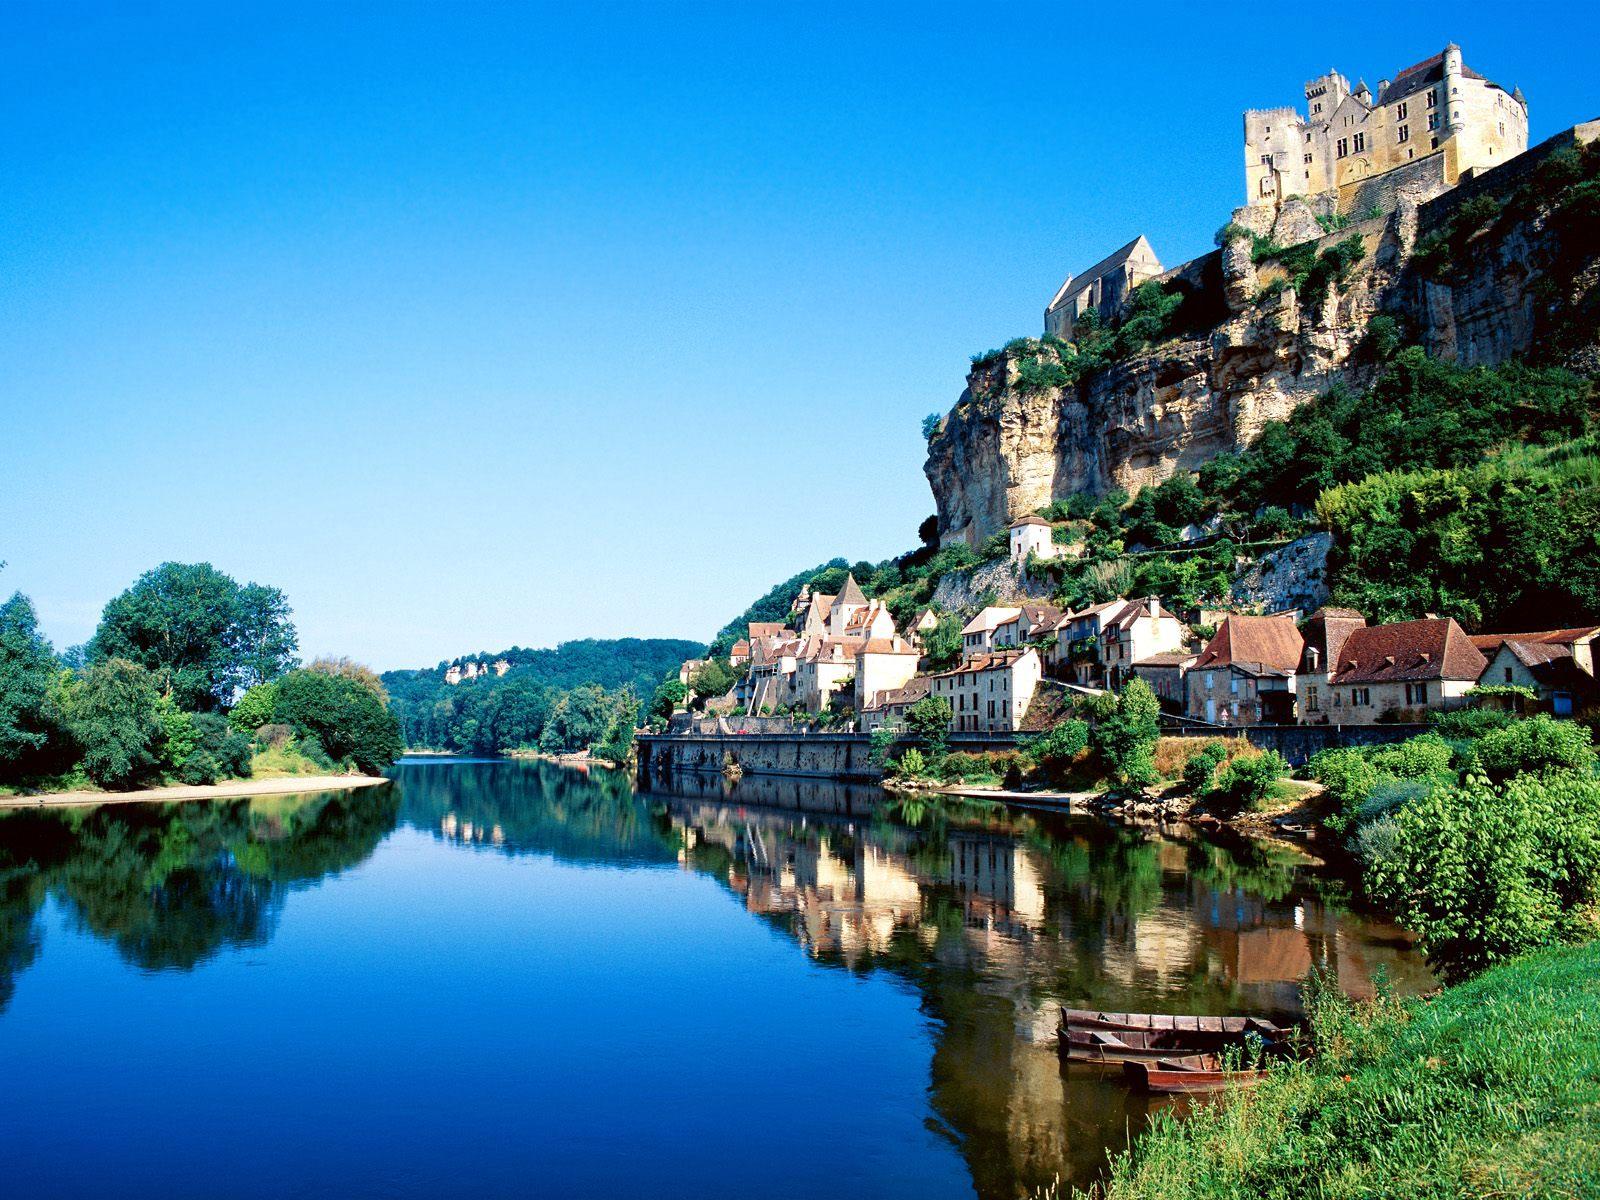 beynac, dordogne river, france.jpg